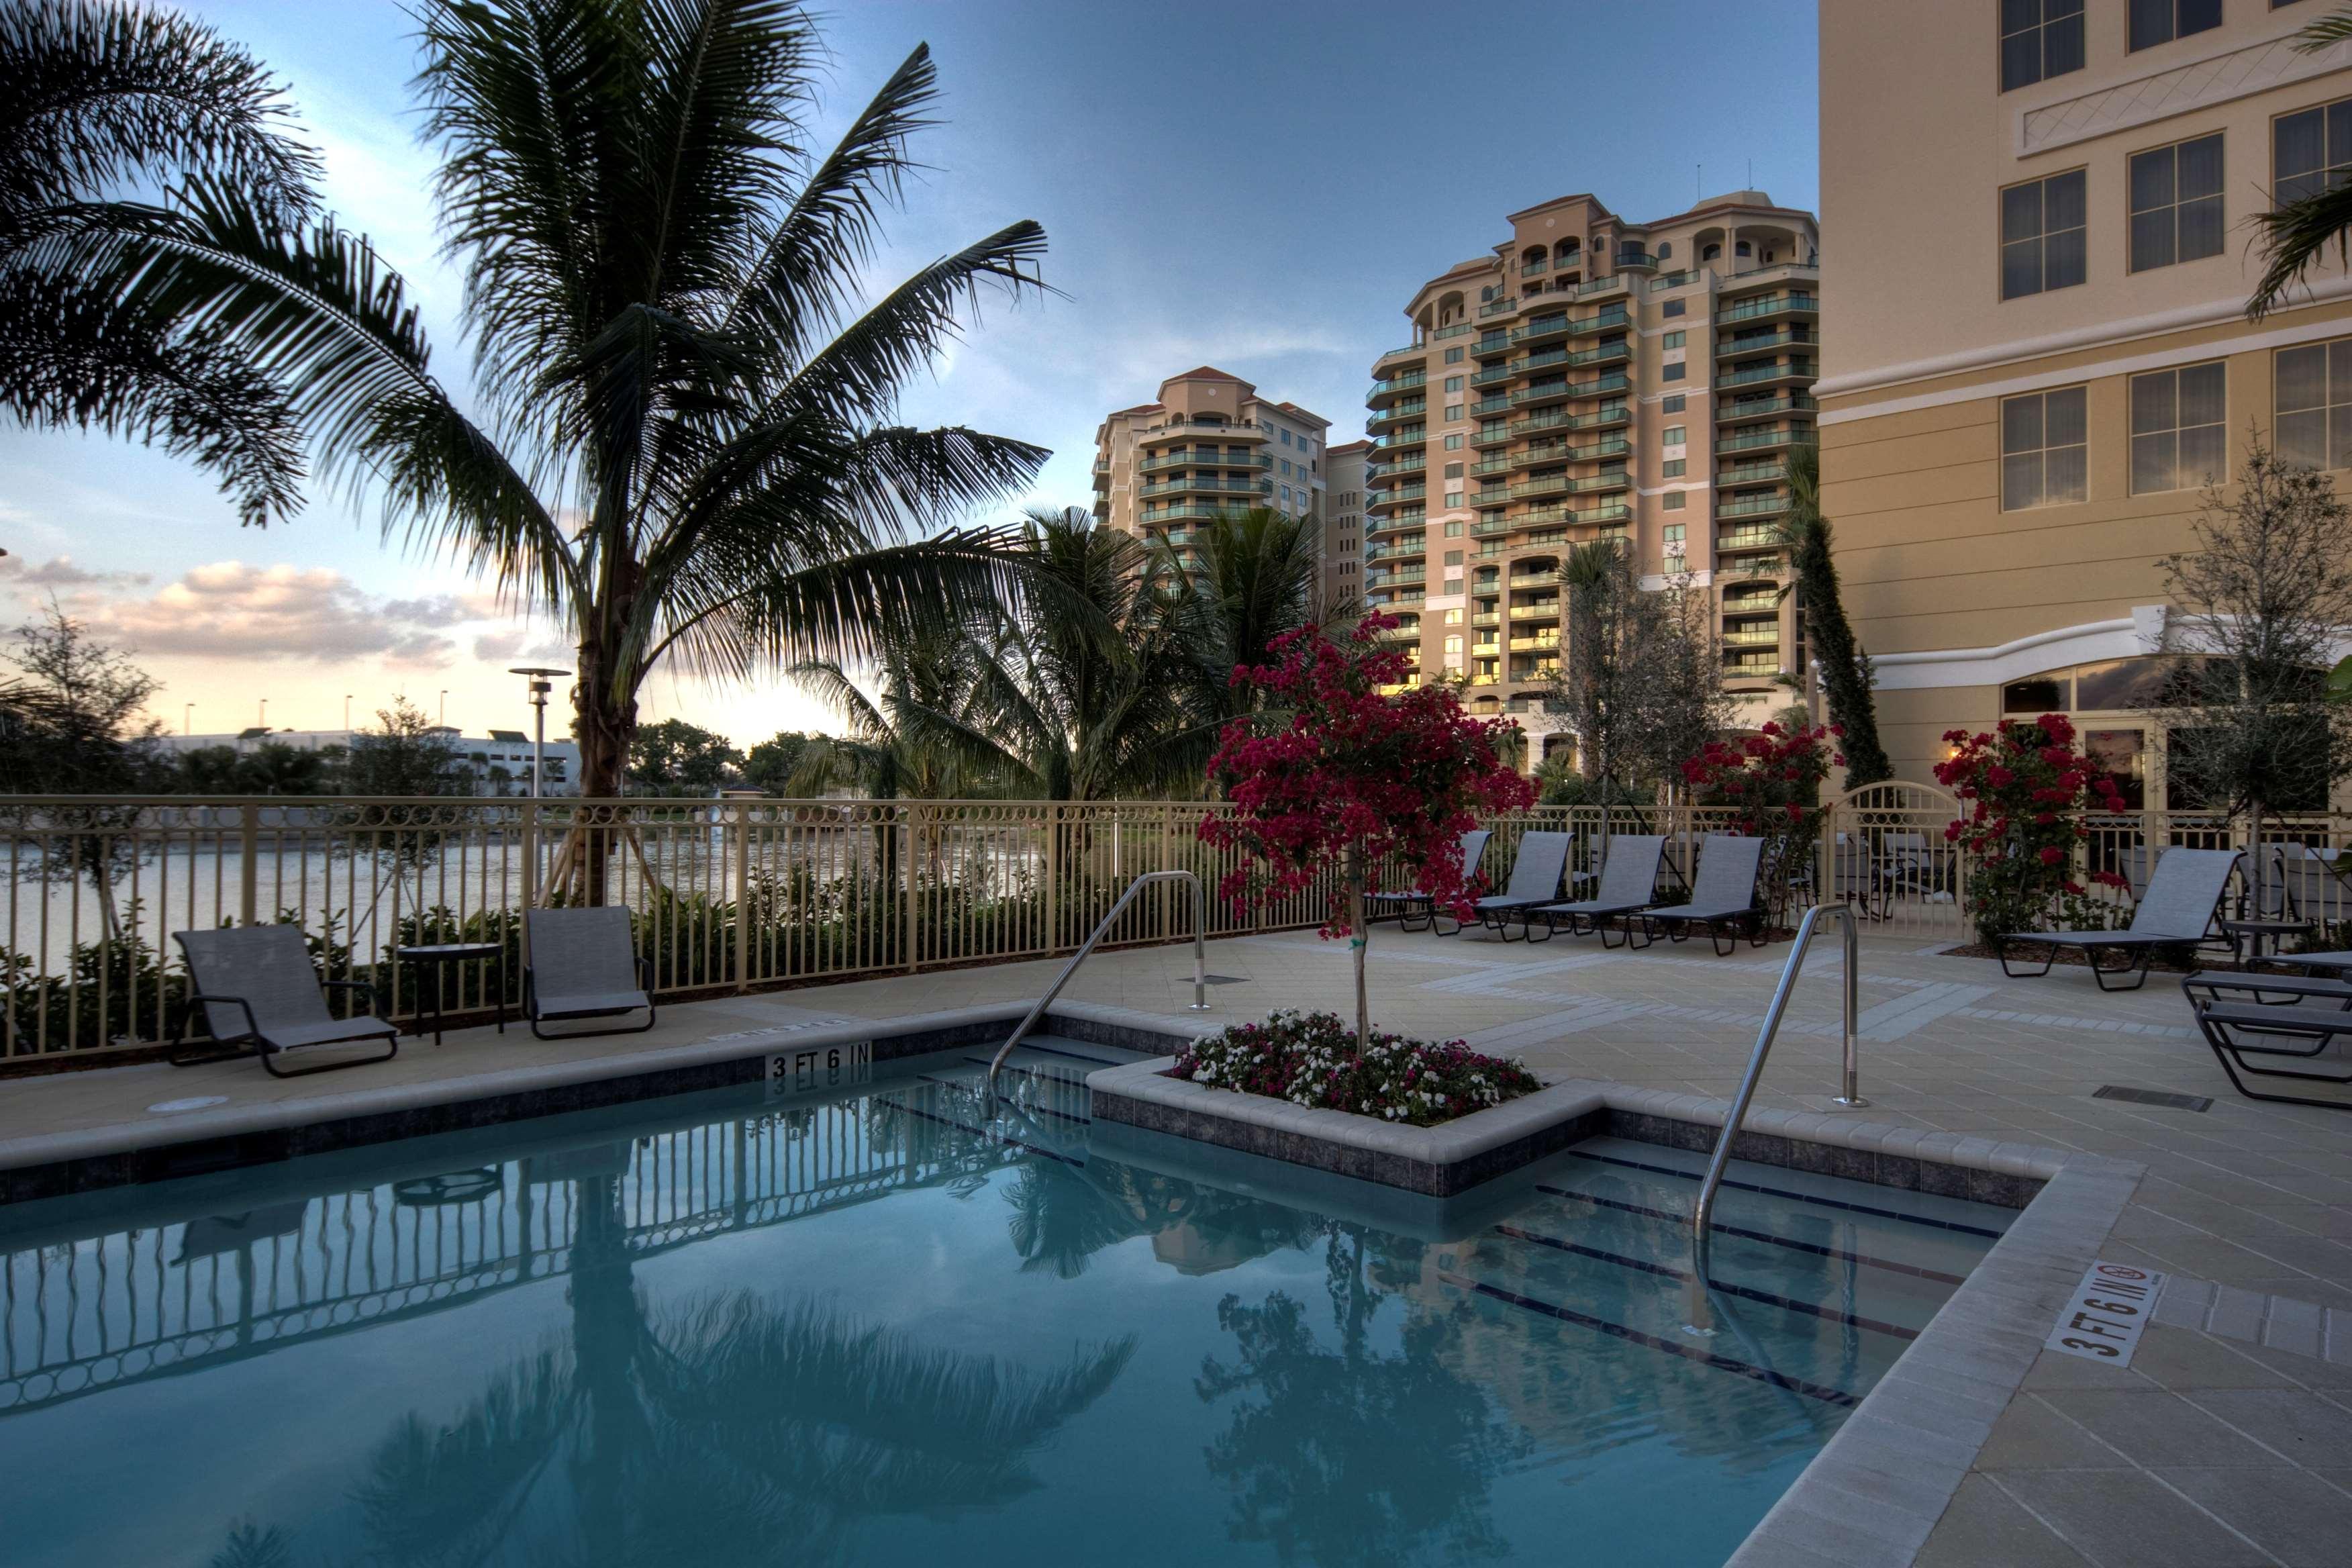 Hilton Garden Inn Palm Beach Gardens image 5